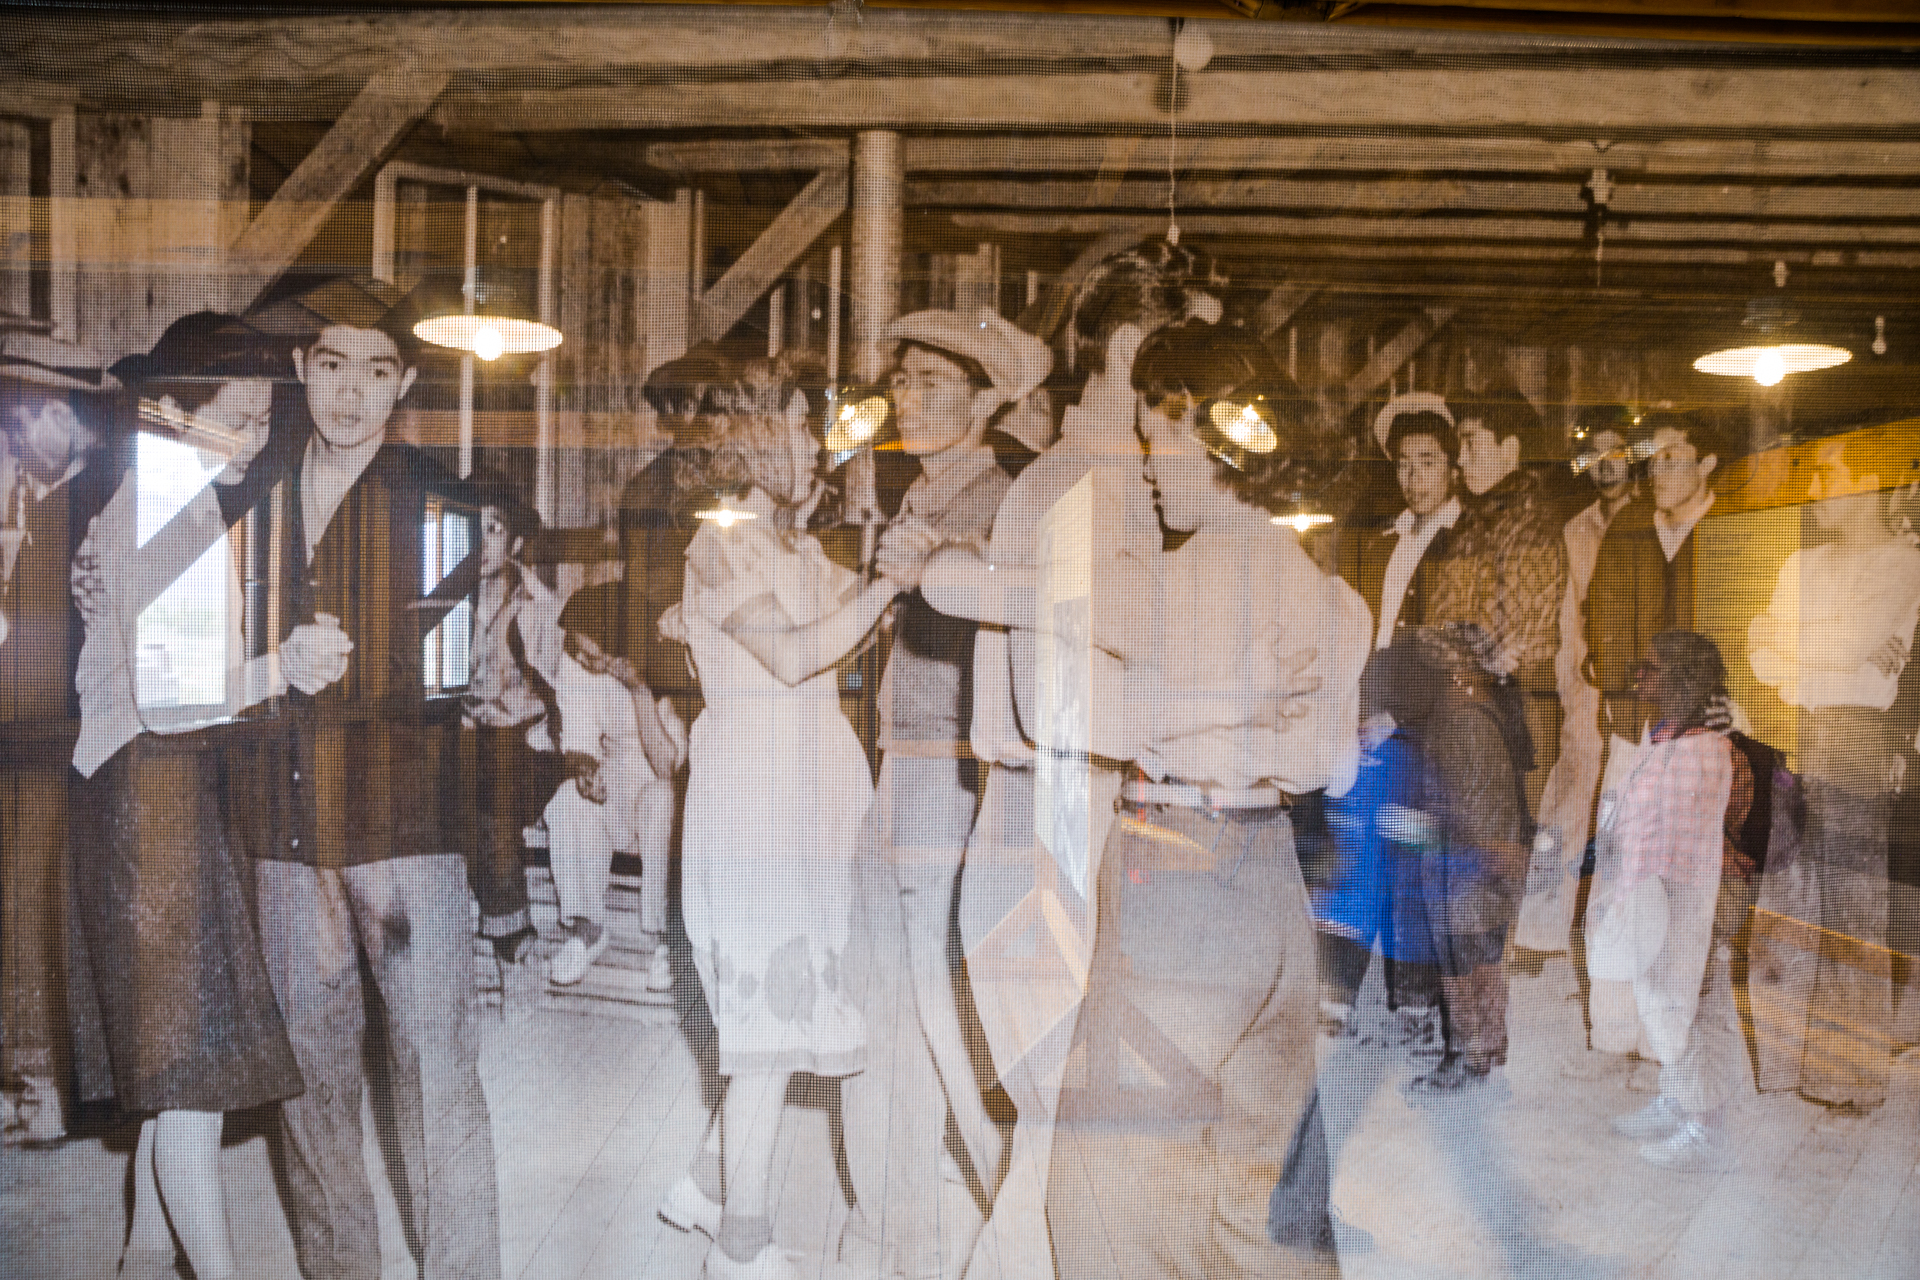 190427_JessVCastillo_Manzanar_lowres-136.jpg